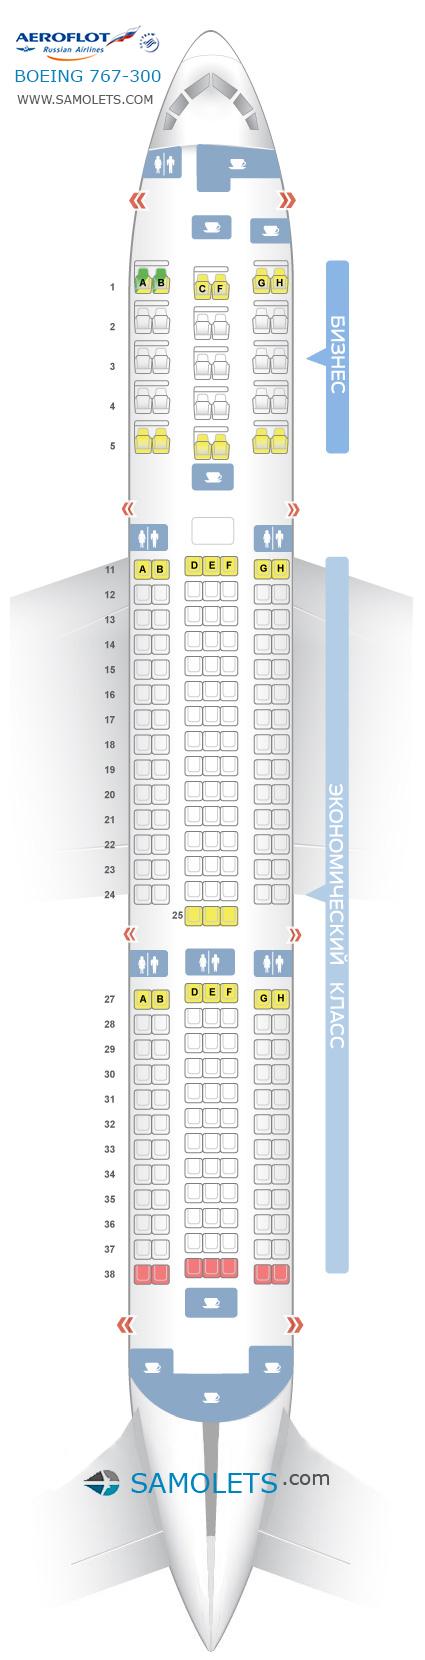 Схема салона Boeing 767-300 VP-BDI - Аэрофлот